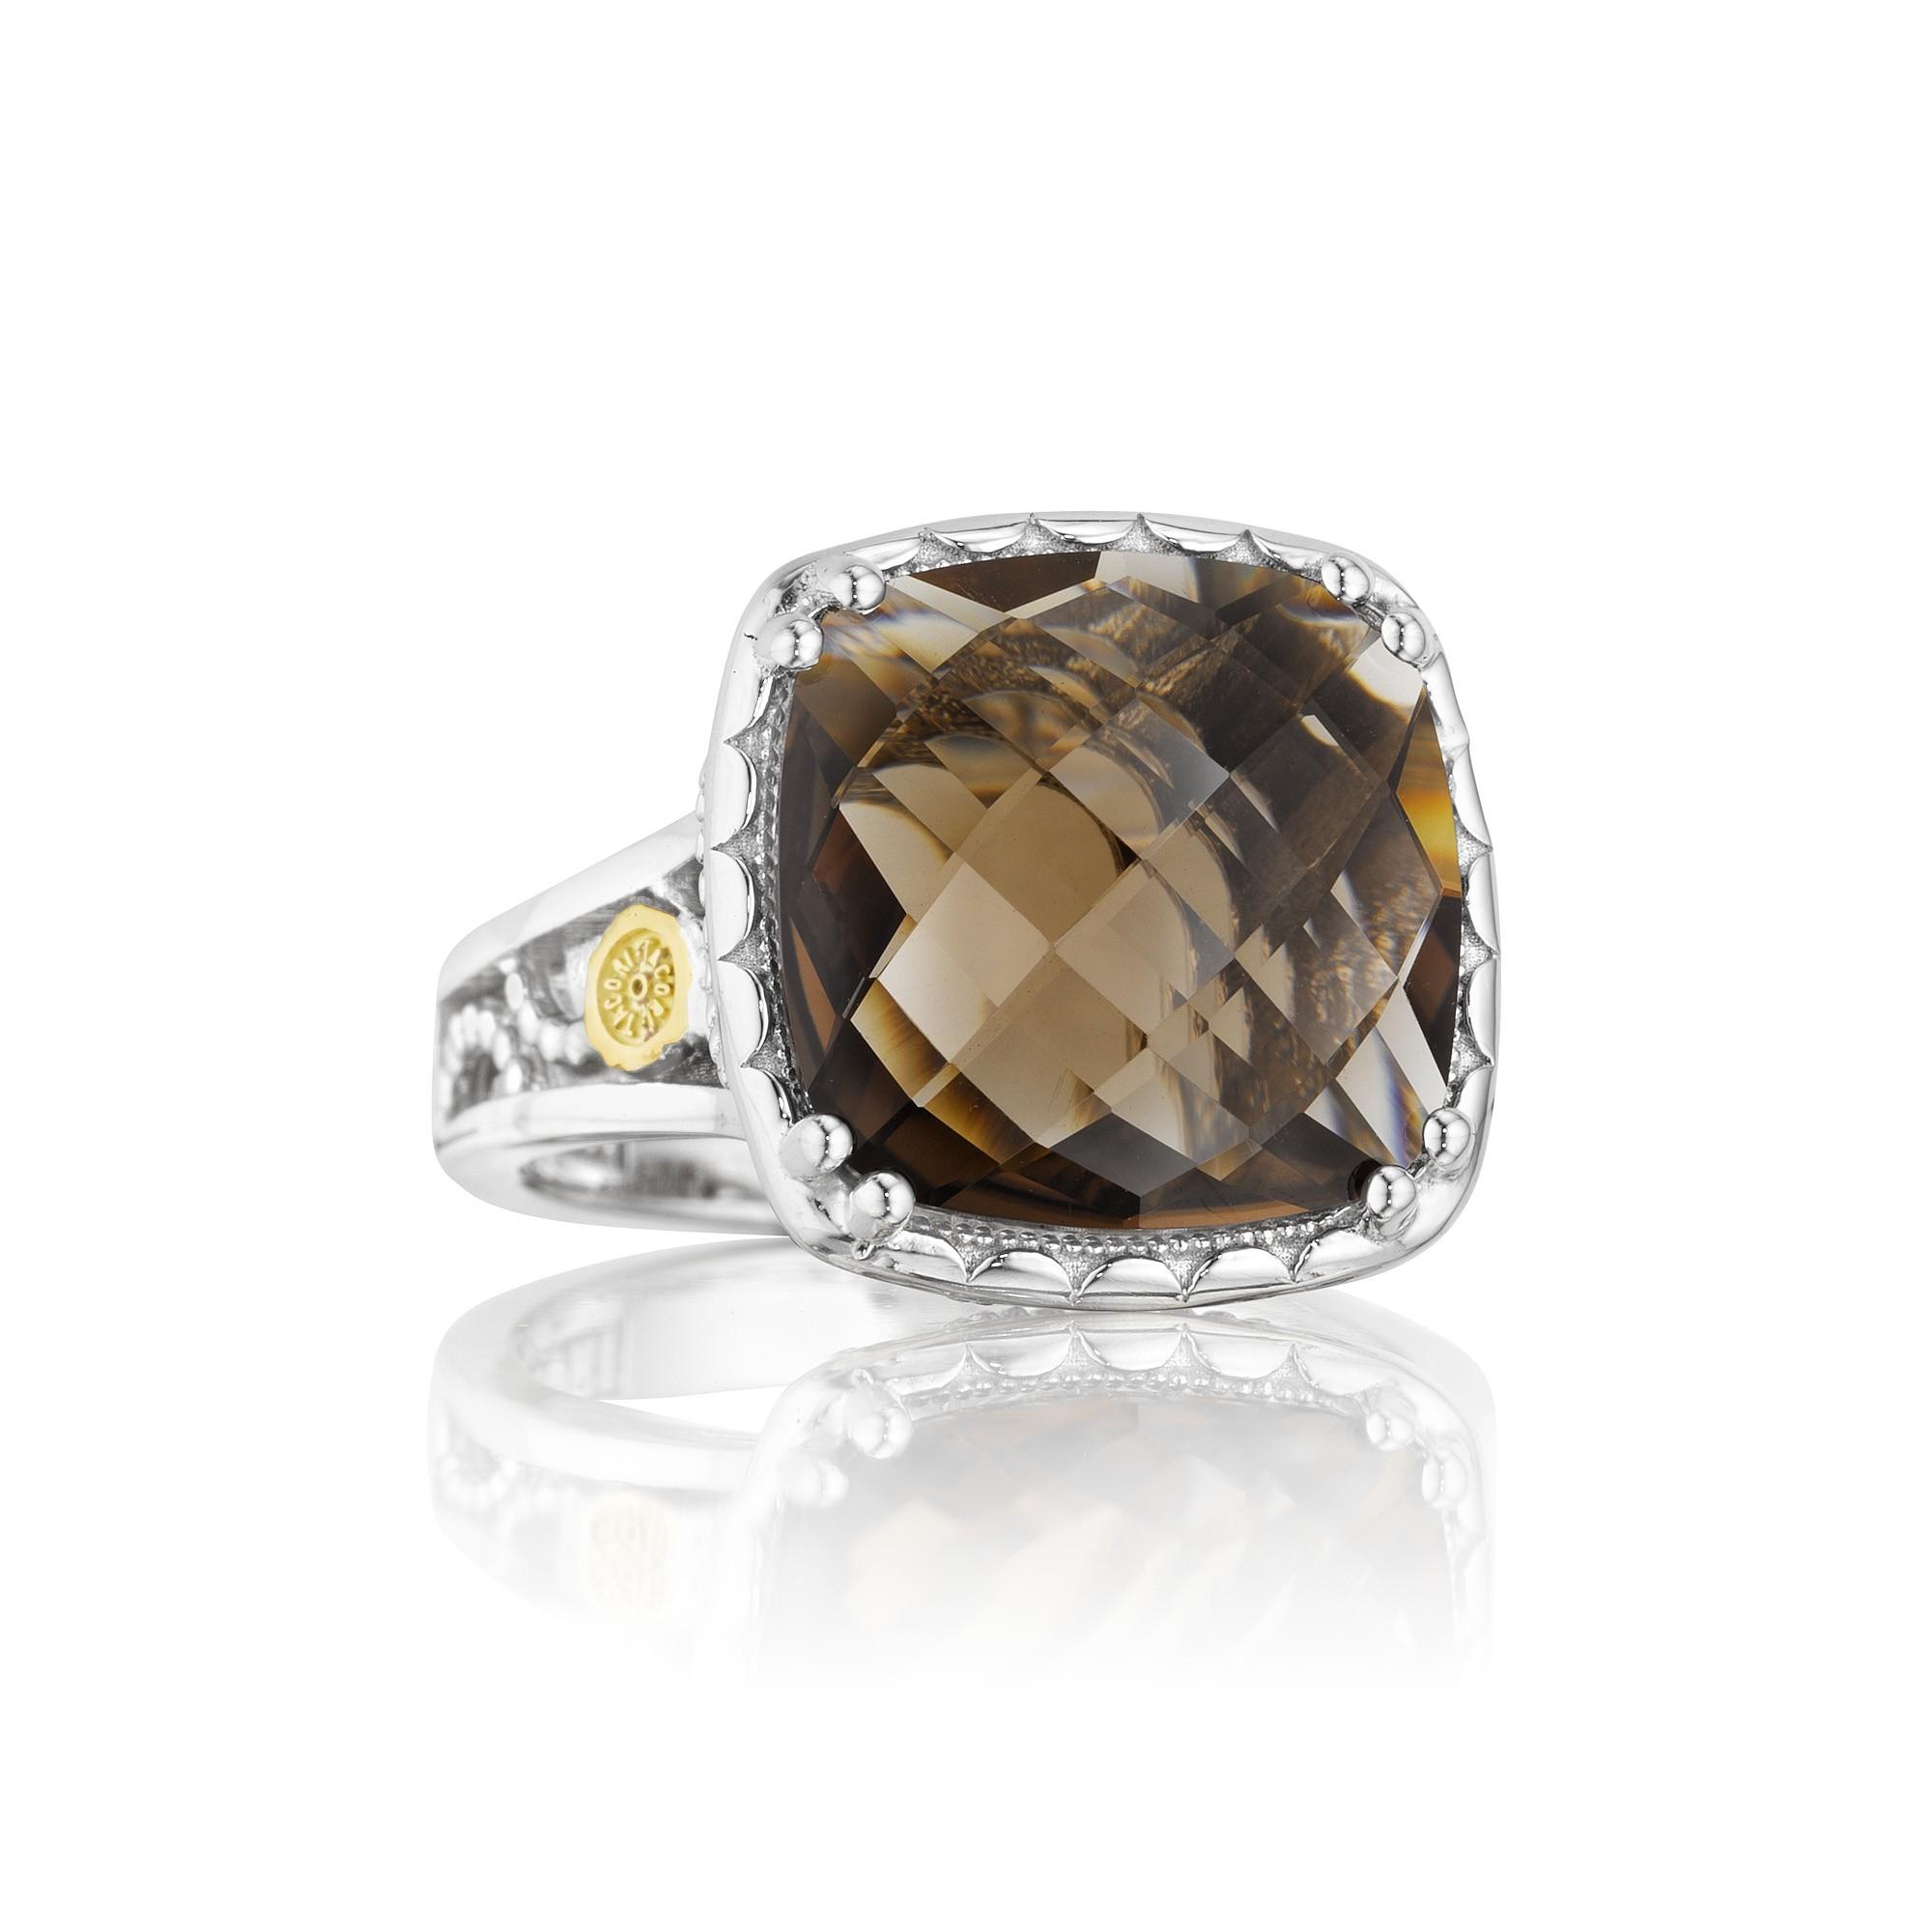 Style# SR12817 - Truffle - Rings - Jewelry - Tacori.com